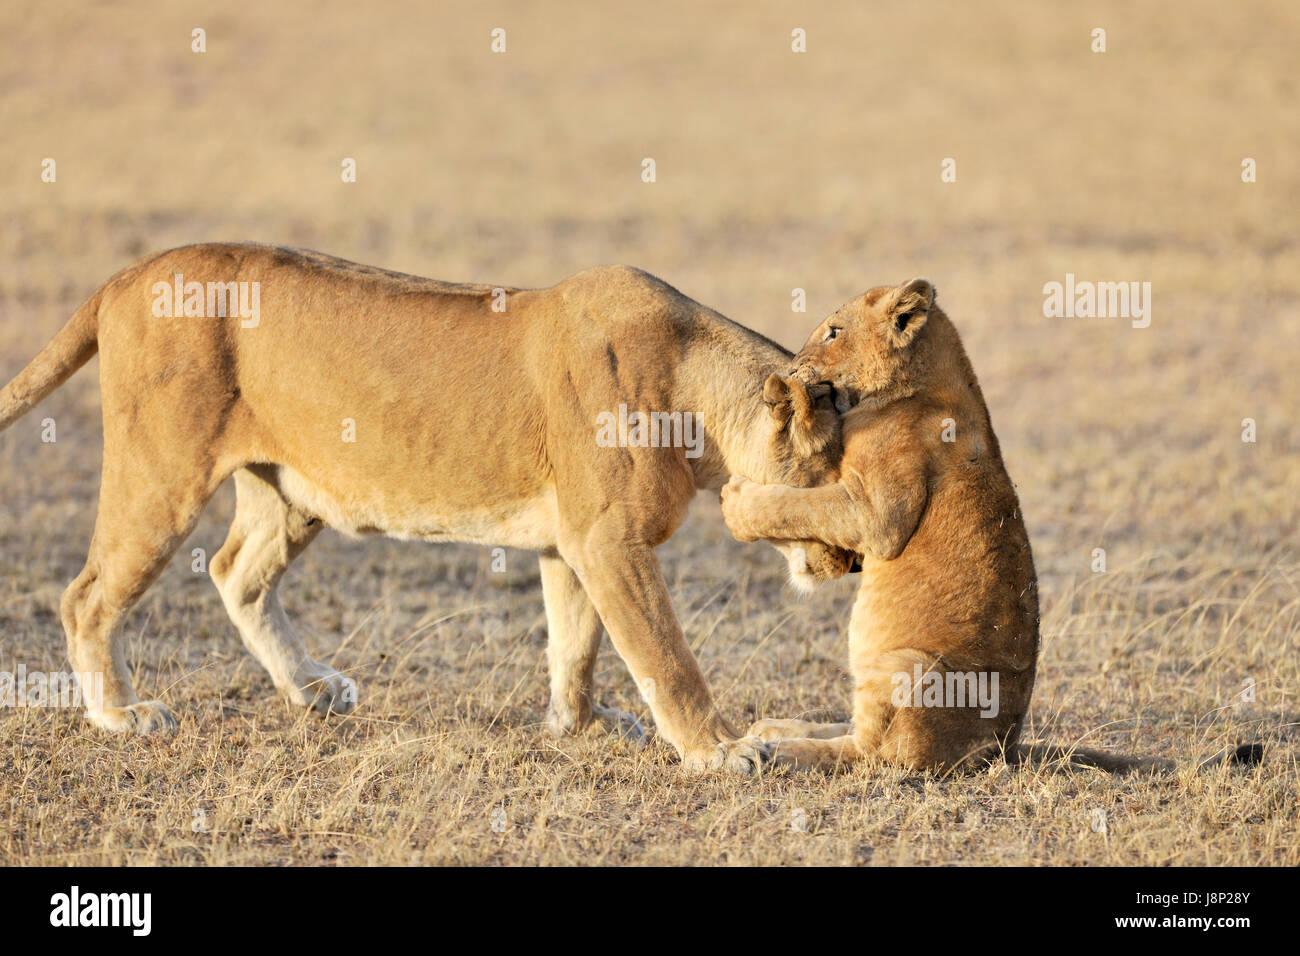 Lion cub (Panthera leo) playing with his mother on the savanna, Serengeti national park, Tanzania - Stock Image